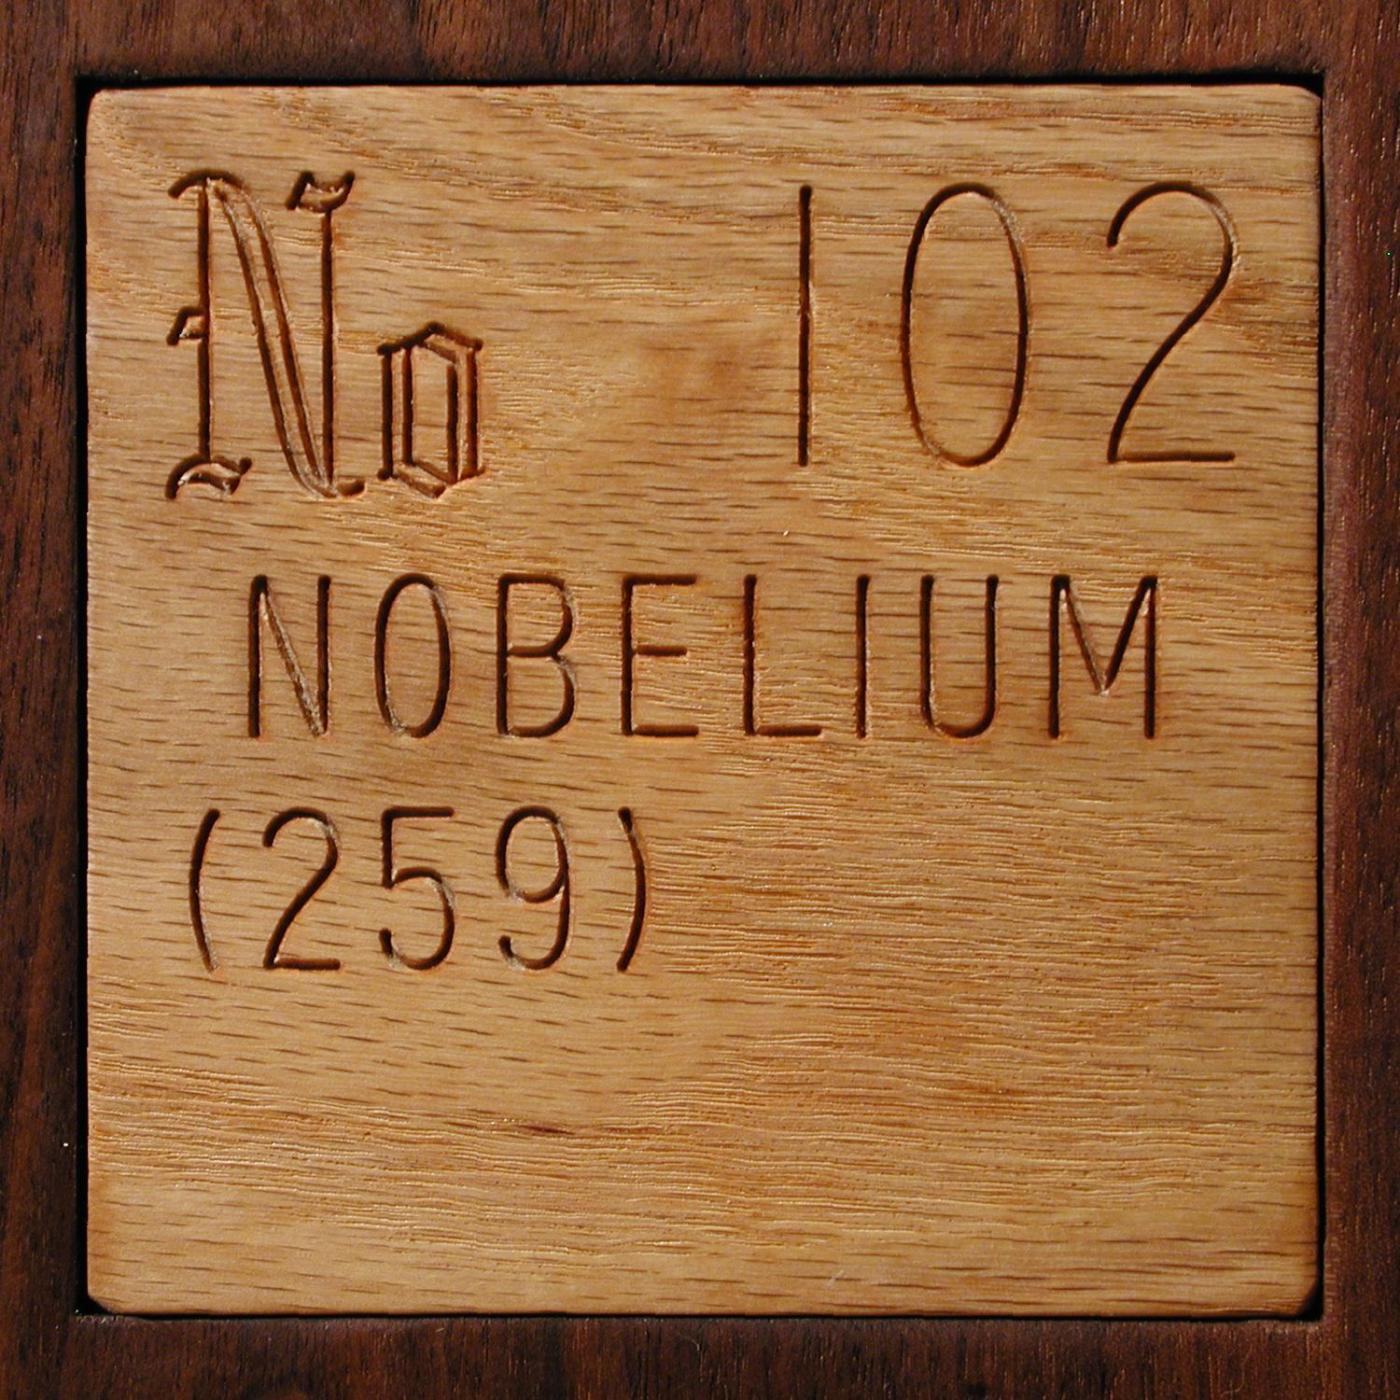 Technical data for the element nobelium in the periodic table nobelium buycottarizona